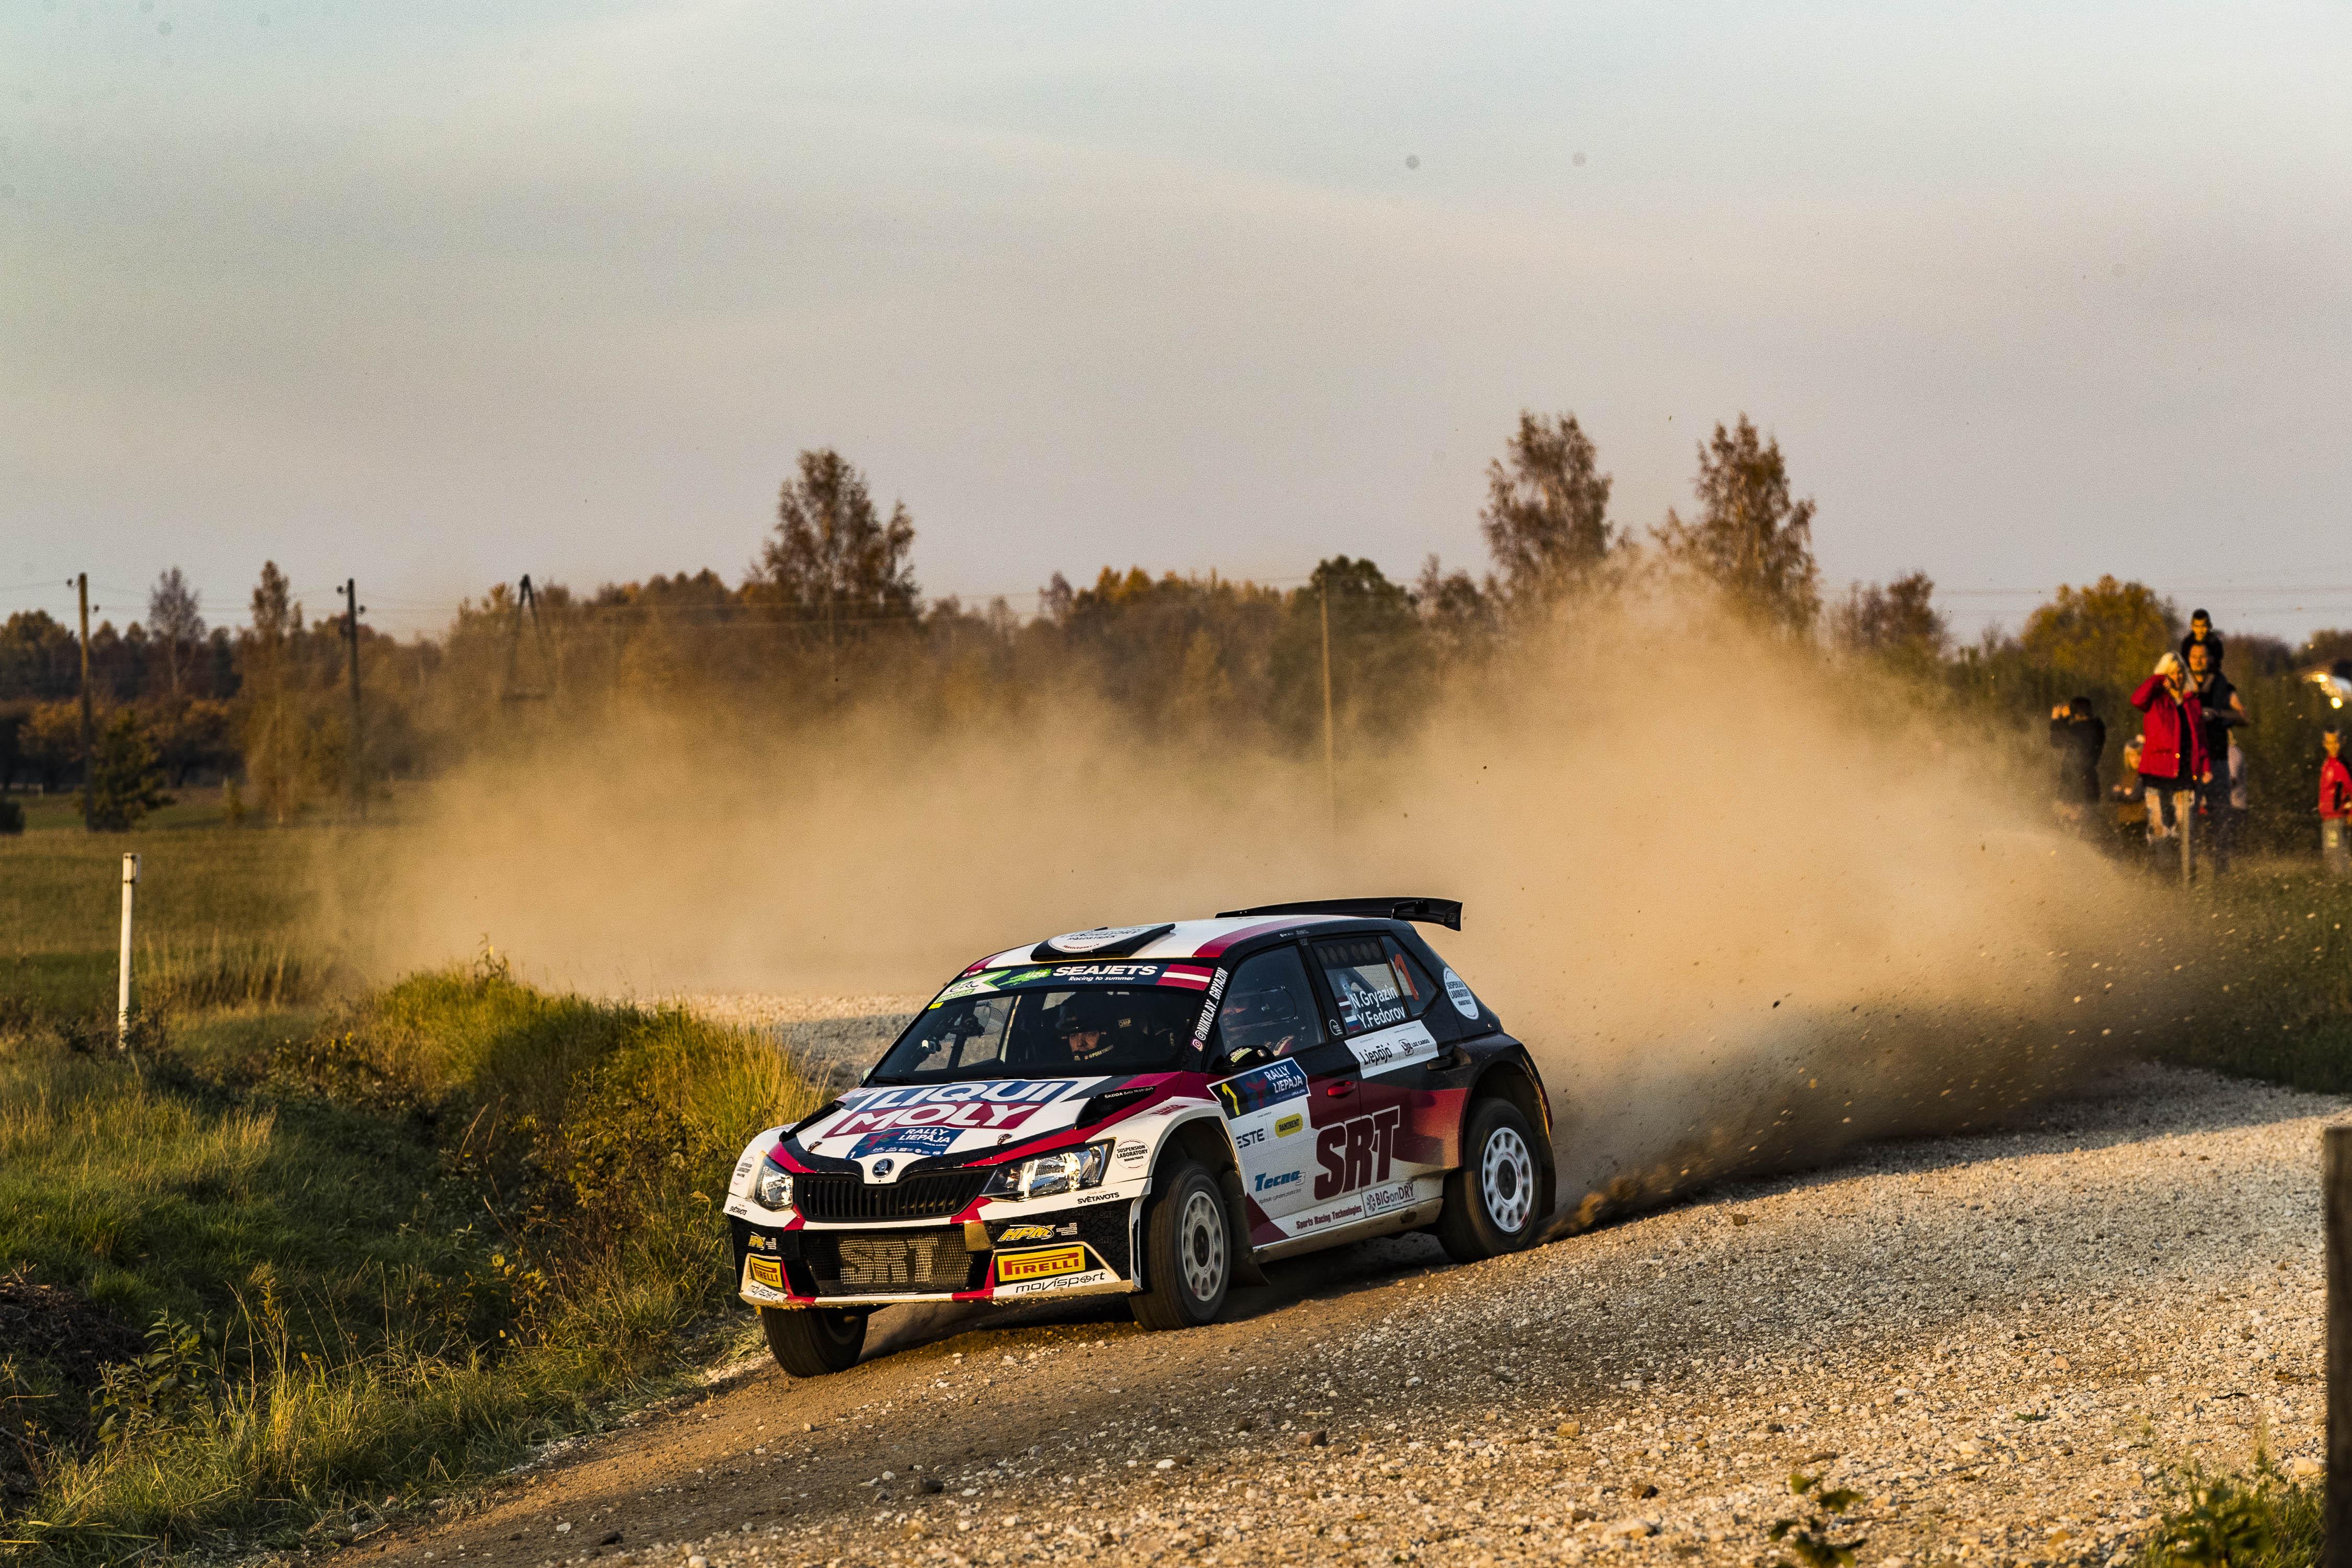 Rally Liepāja 2019 - FIA ERC | European Rally Championship